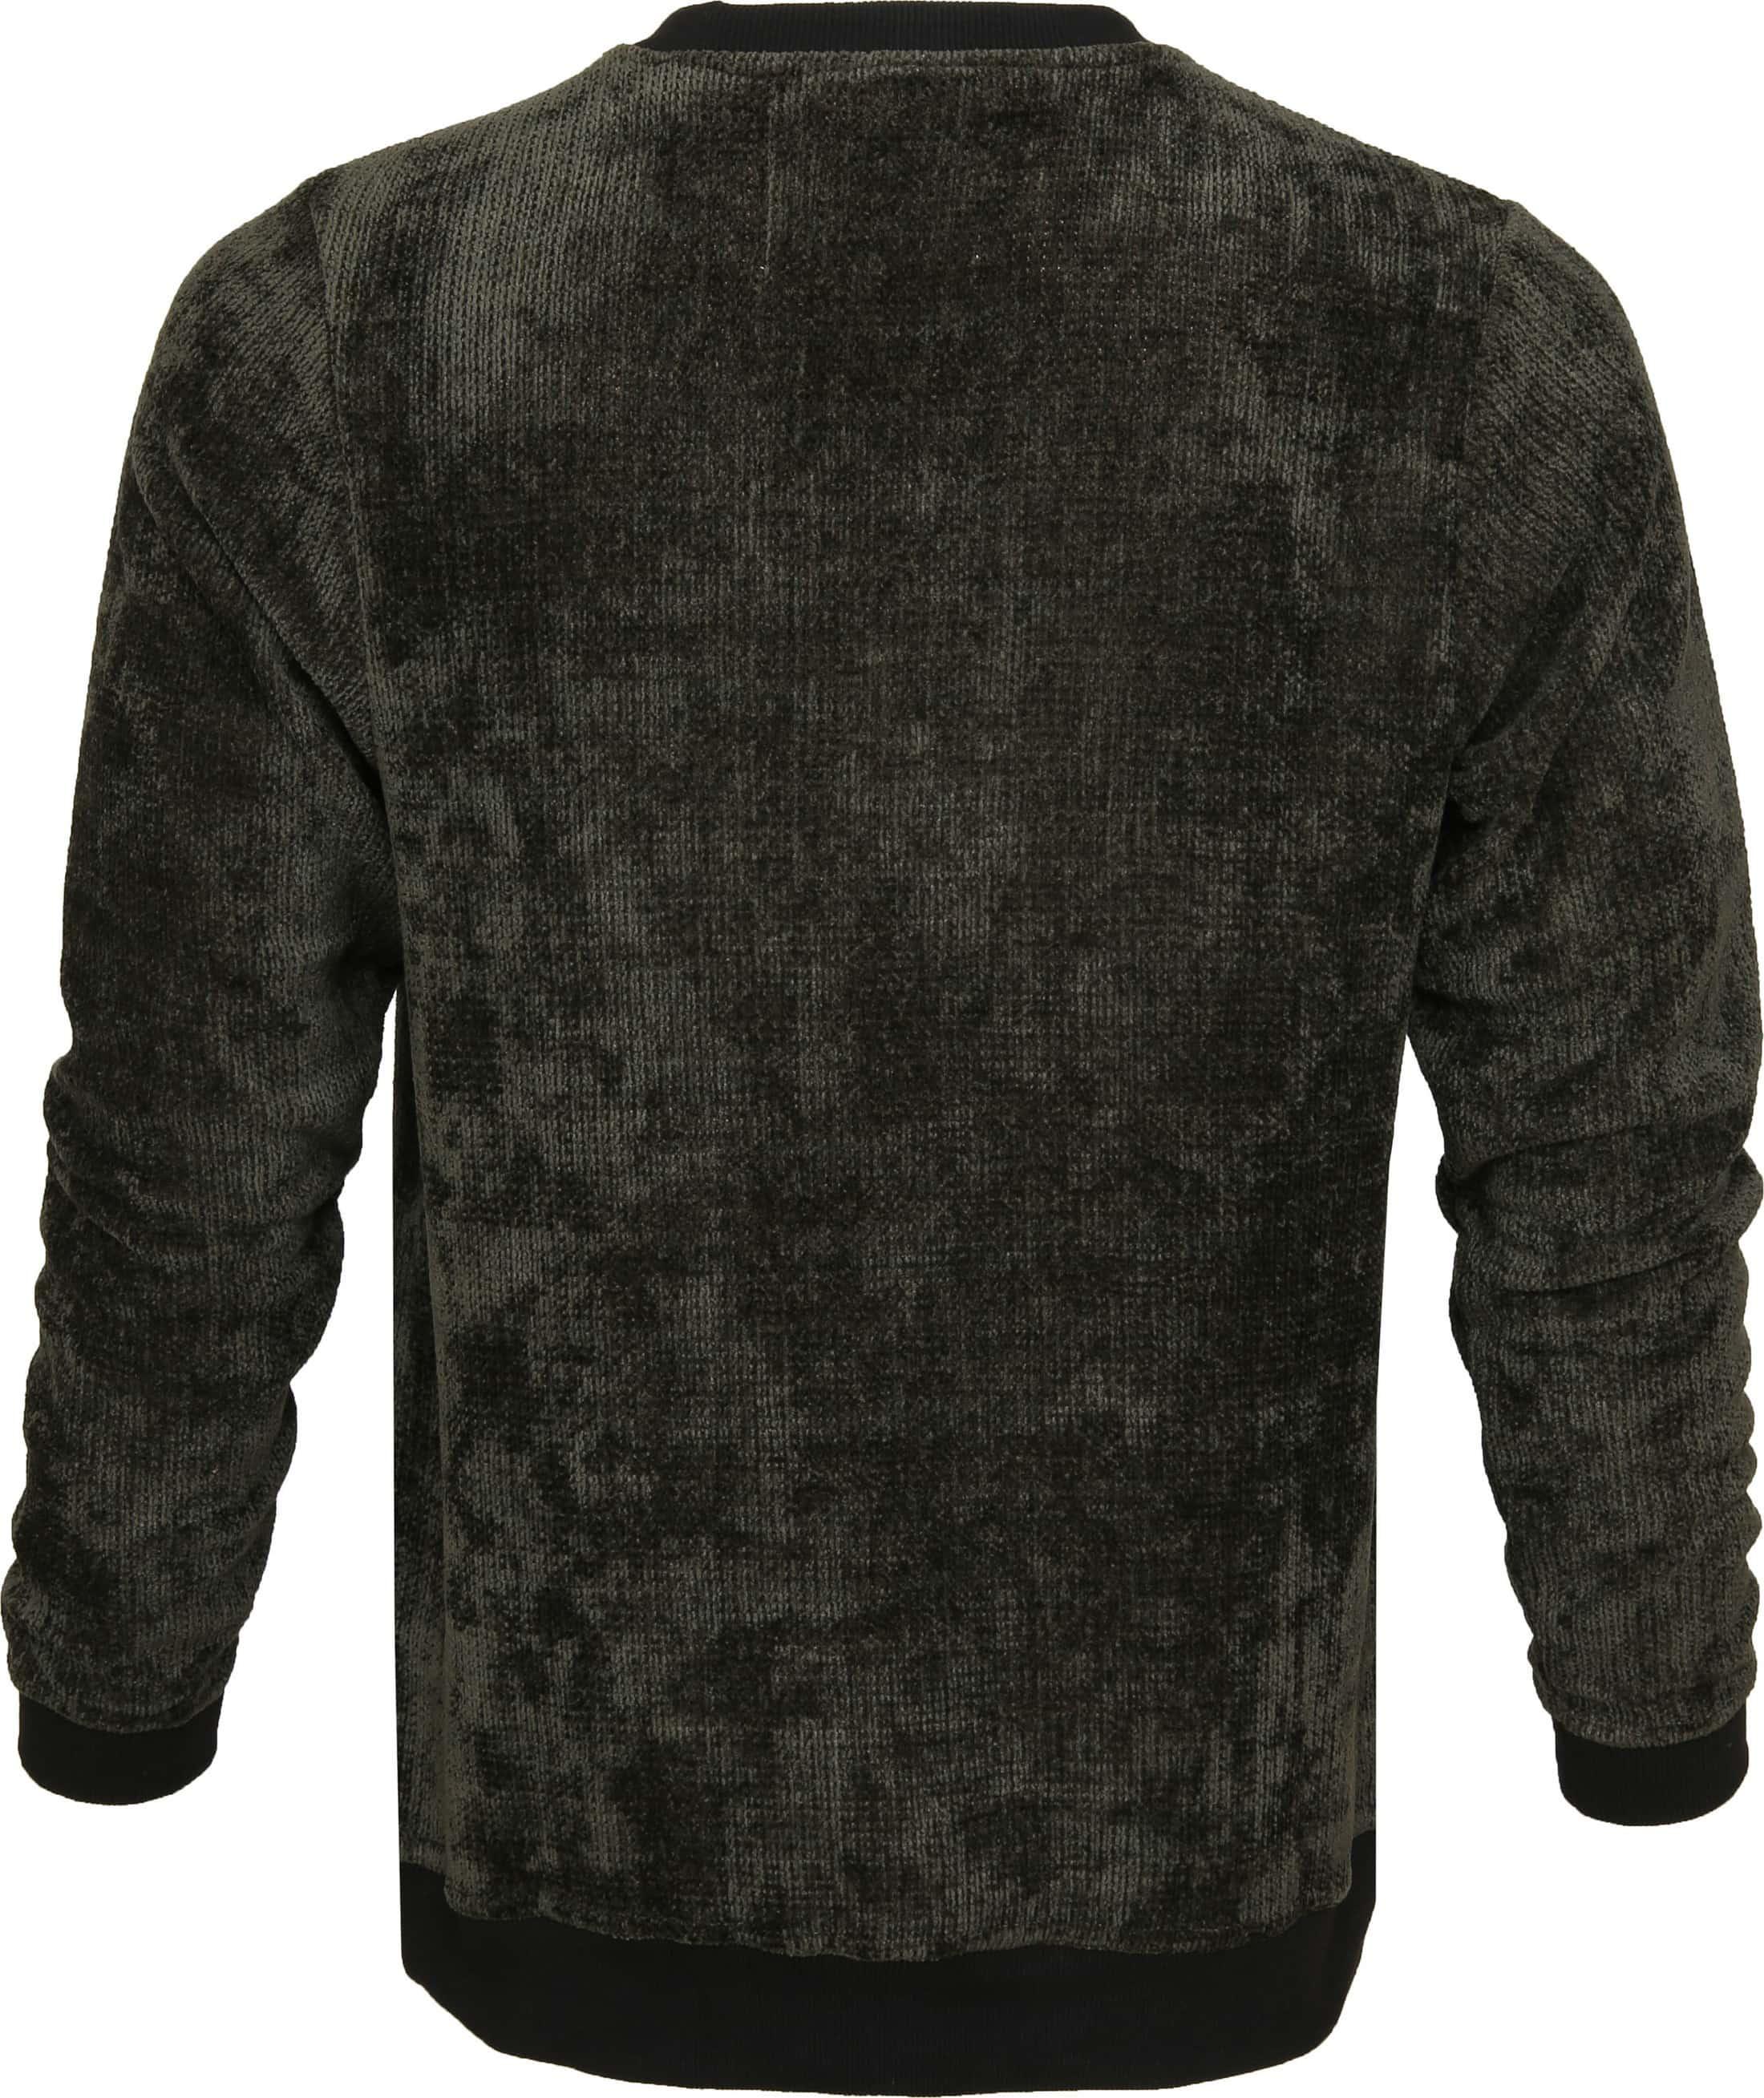 Anerkjendt Akalex Sweater Dark Green foto 3